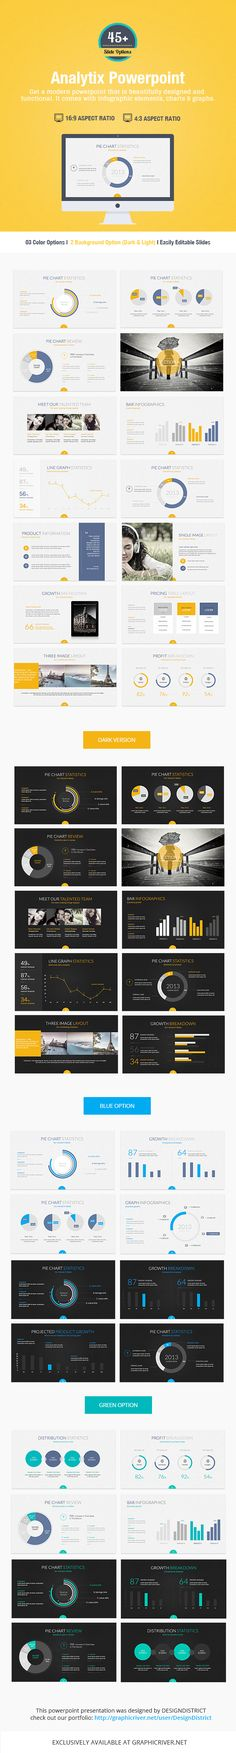 Analytix Powerpoint by Design District, via Behance